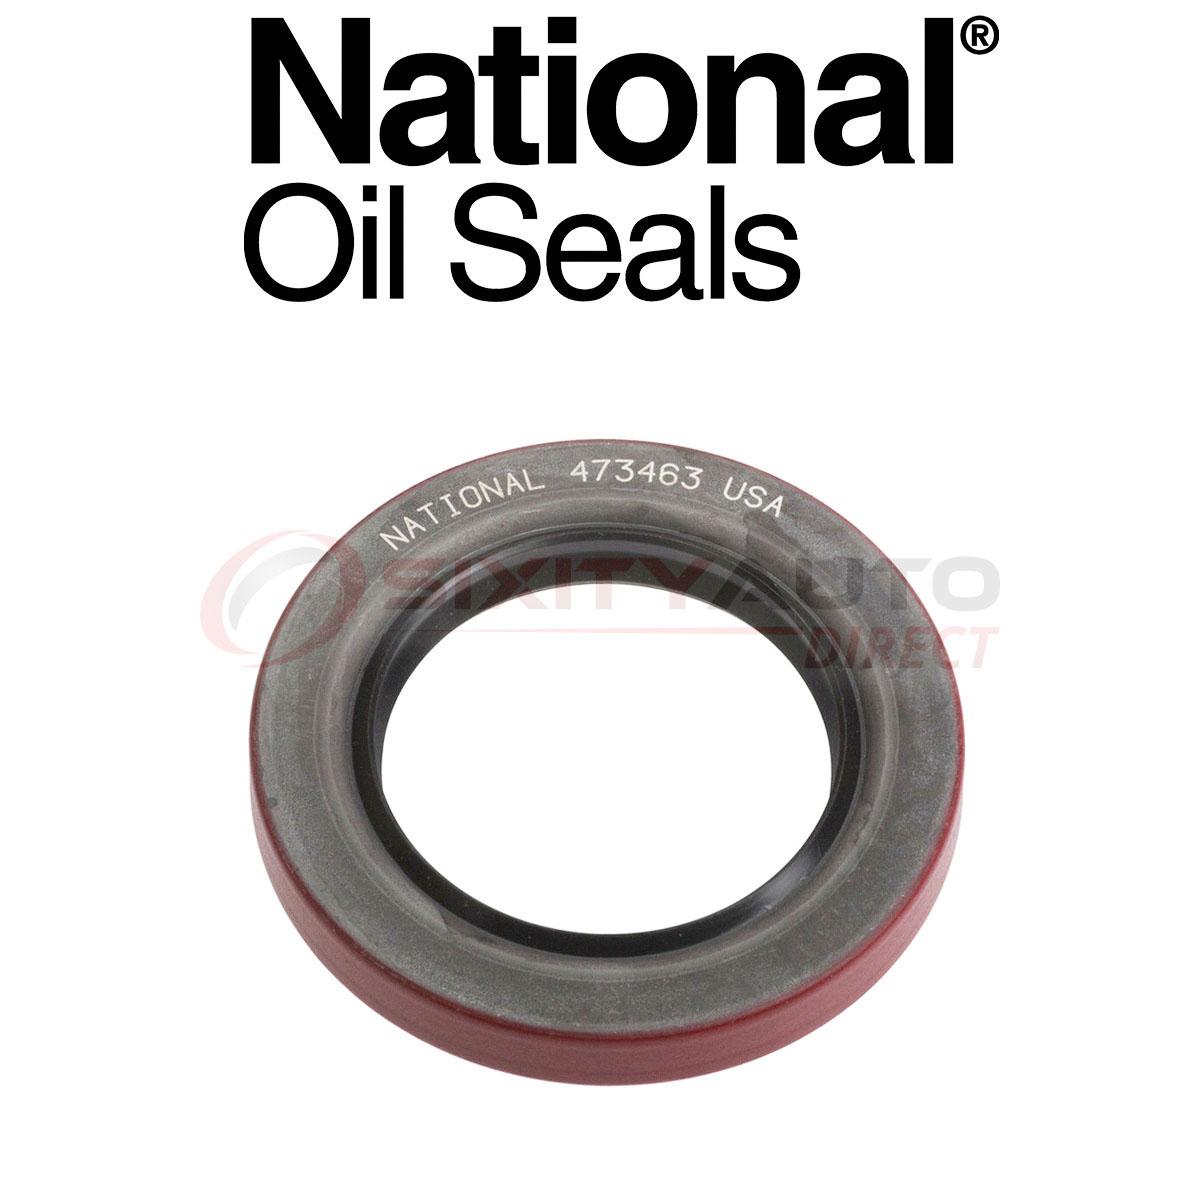 National Bearing 99133 Rear Axle Shaft Seal